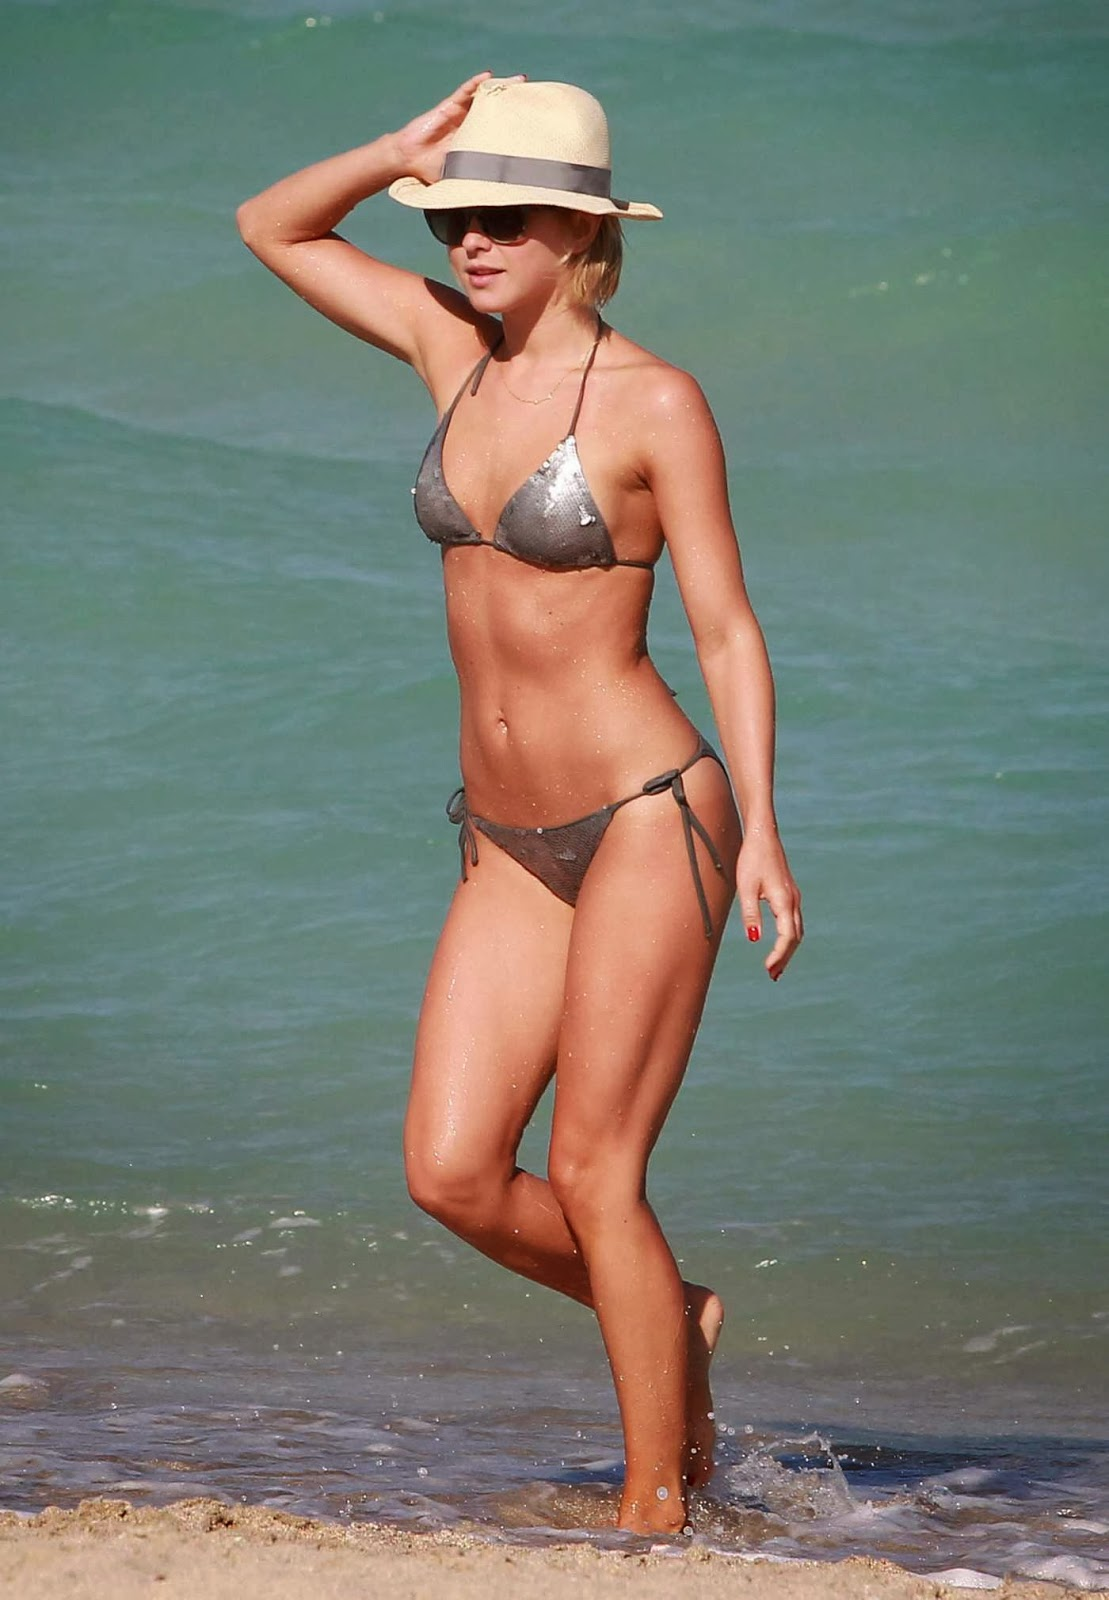 julianne hough bikini pics jpg 1500x1000